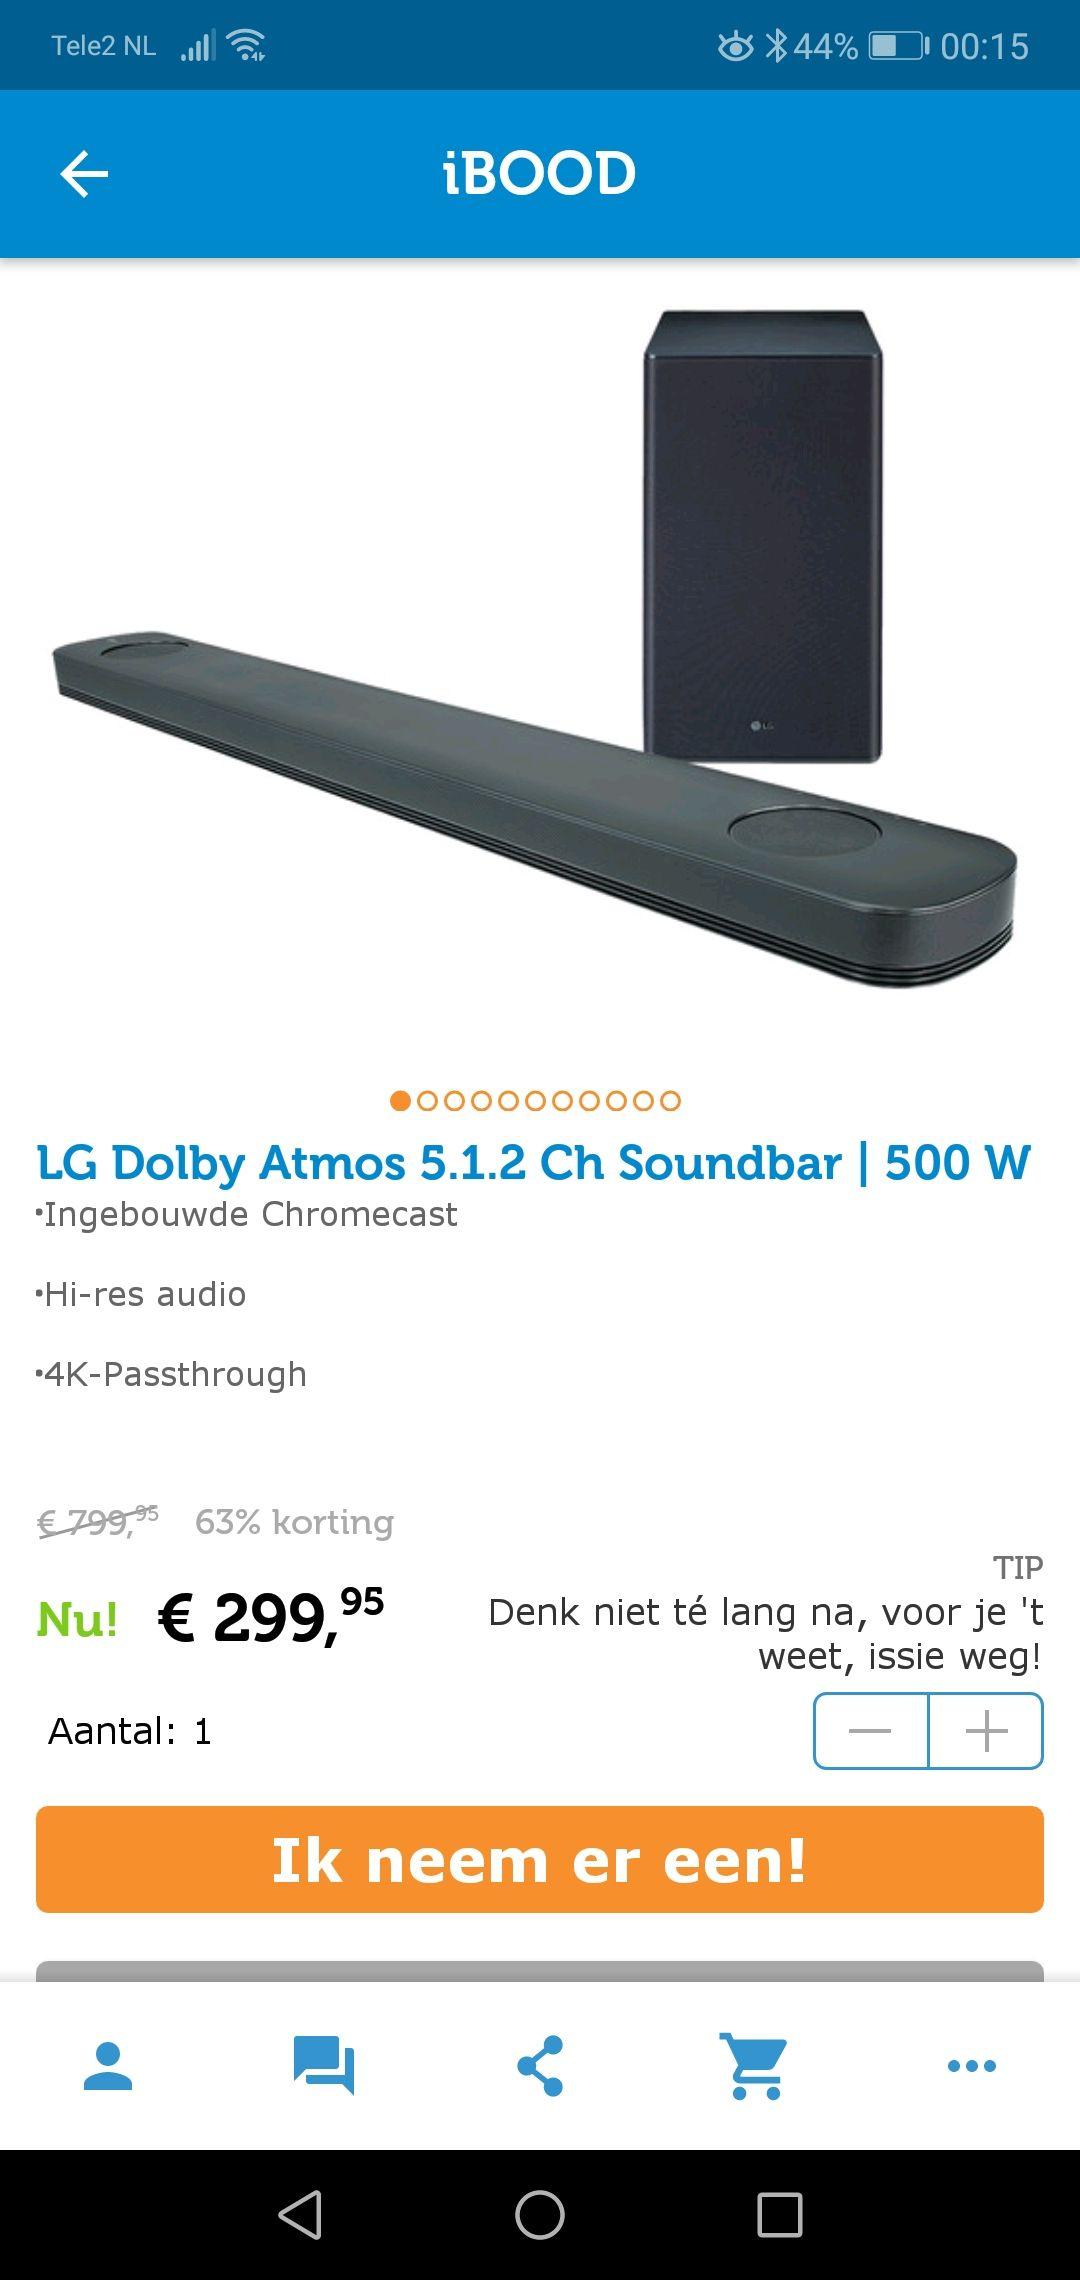 LG Dolby Atmos 5.1.2 soundbar met Chromecast built in